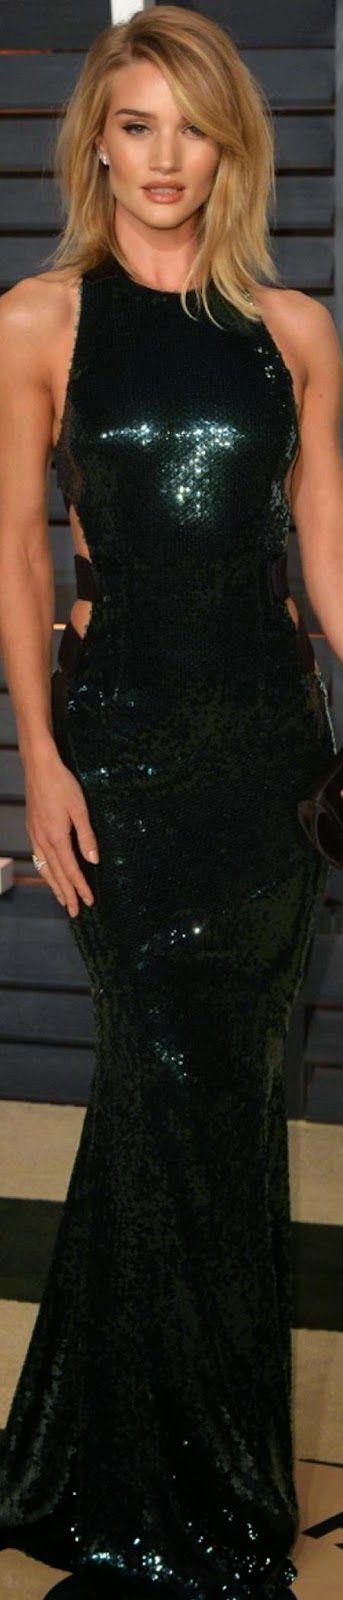 Rosie Huntington Whiteley 2015 Vanity Fair Oscar Party.. Alexandre Vauthier ❤